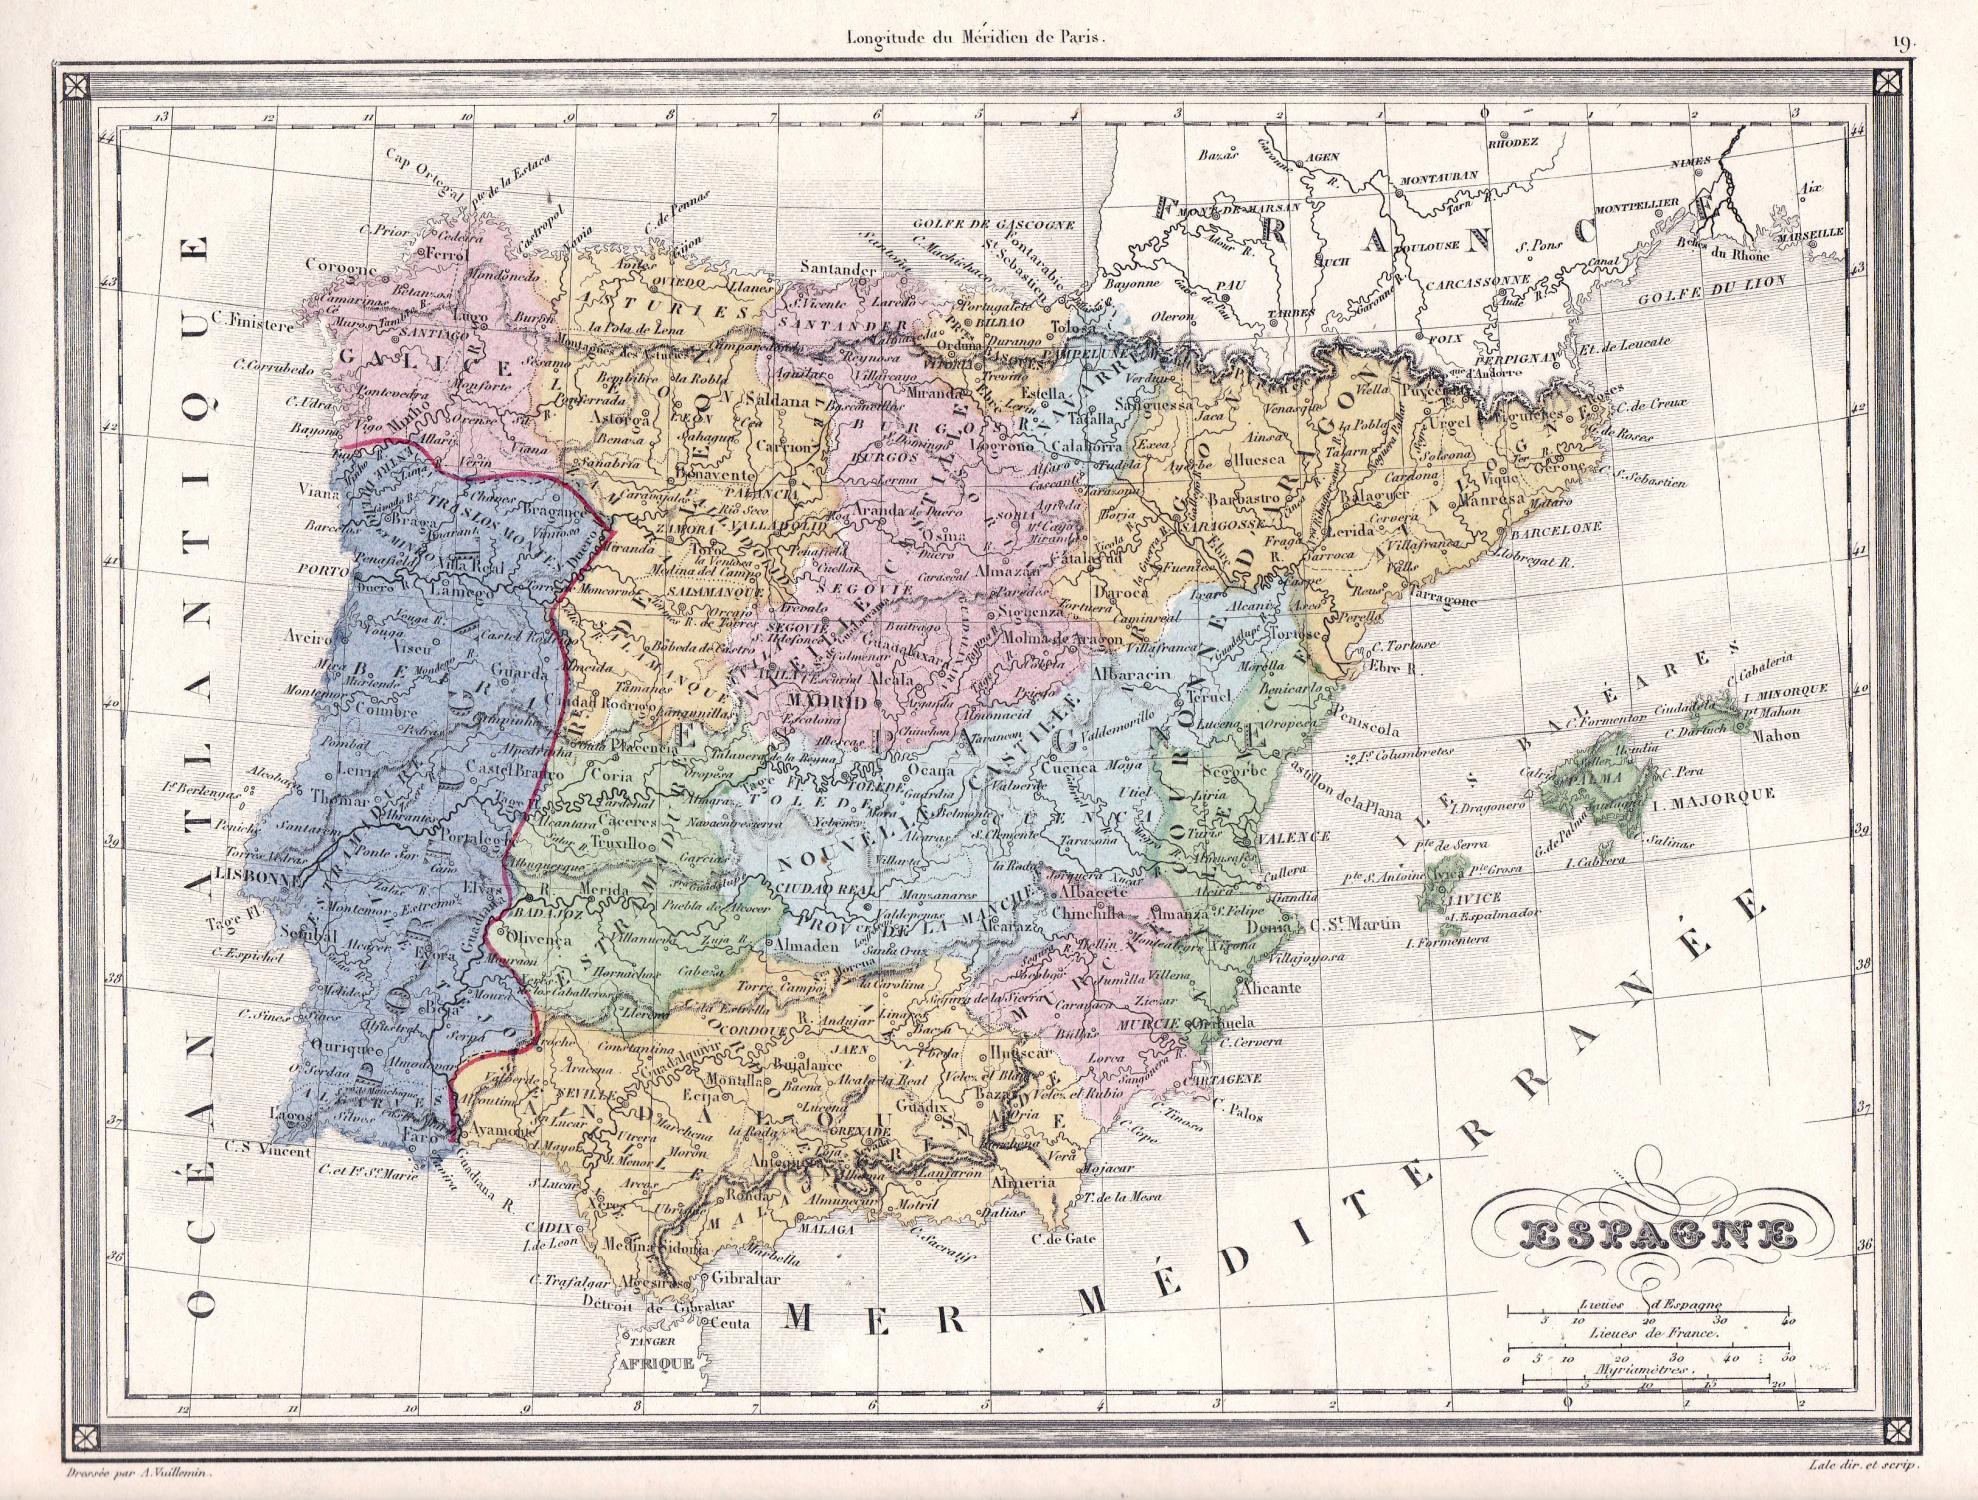 Espagne Spain Spanien Espagne Portugal Madrid Europe Europa Karte